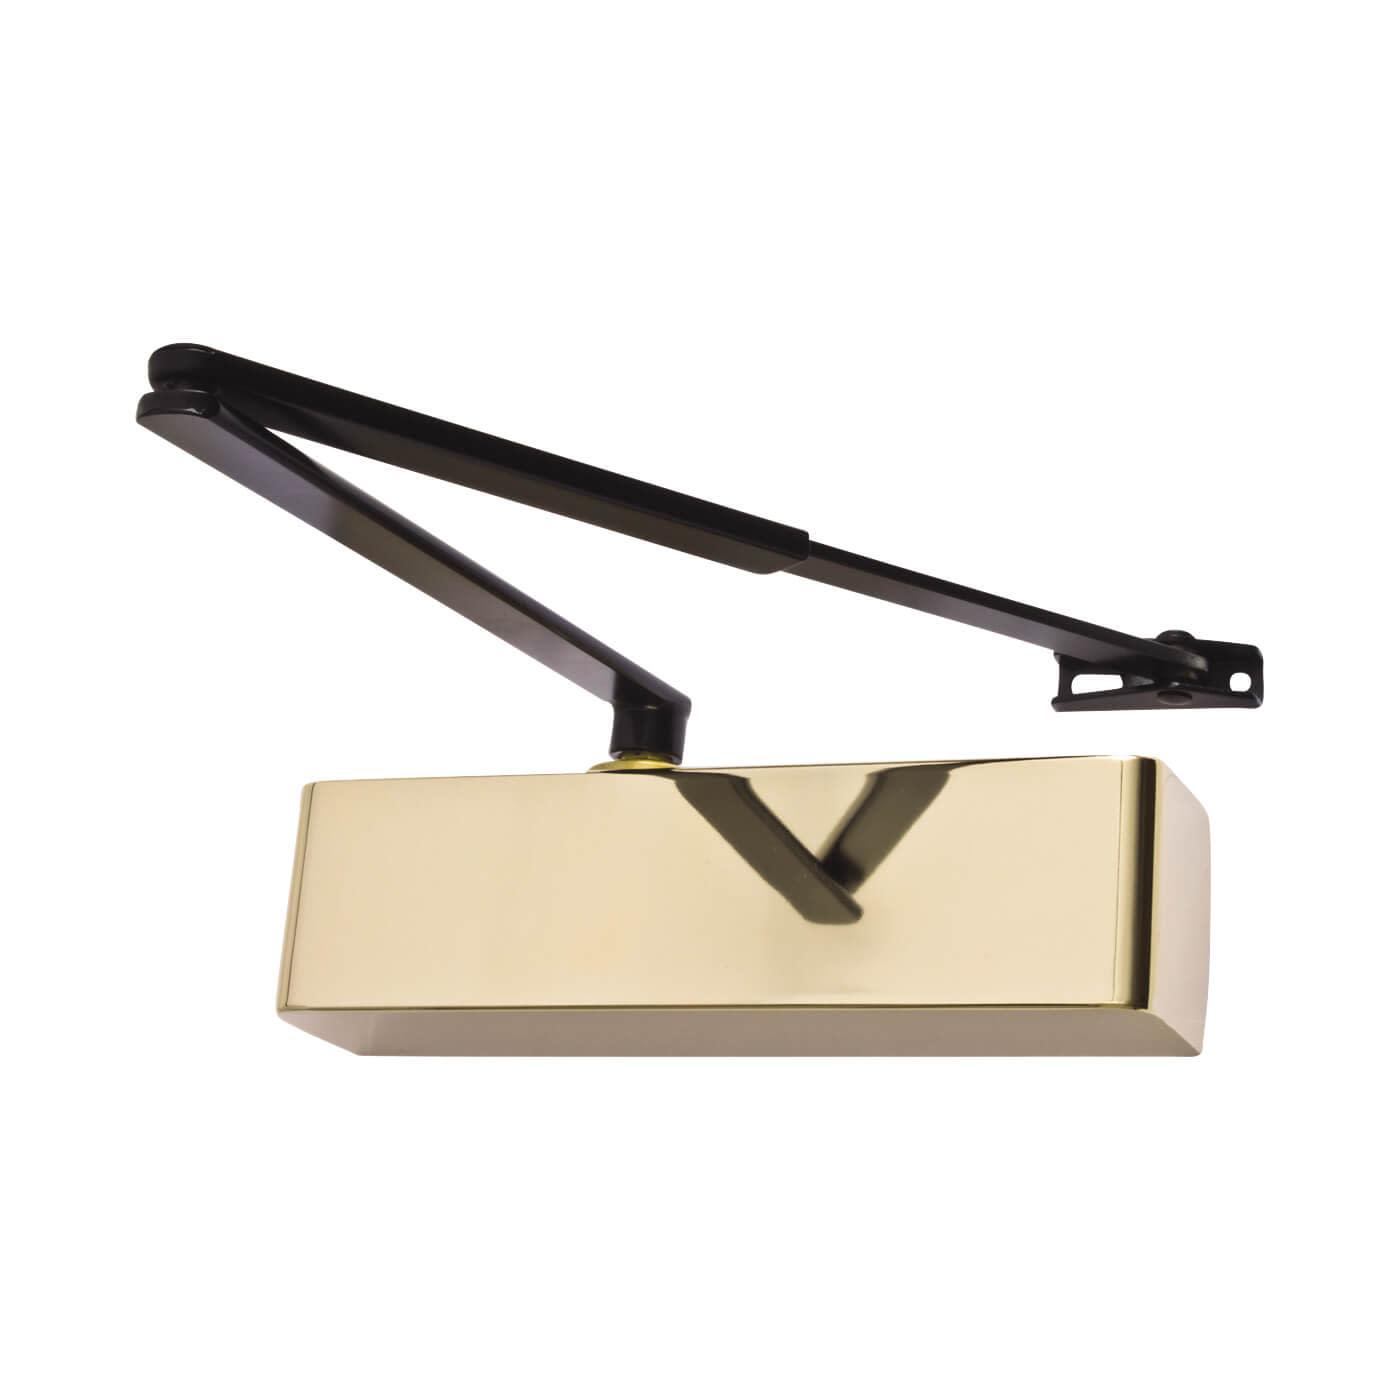 Arrone® AR1500 Door Closer - Black Arm - Brass Cover)